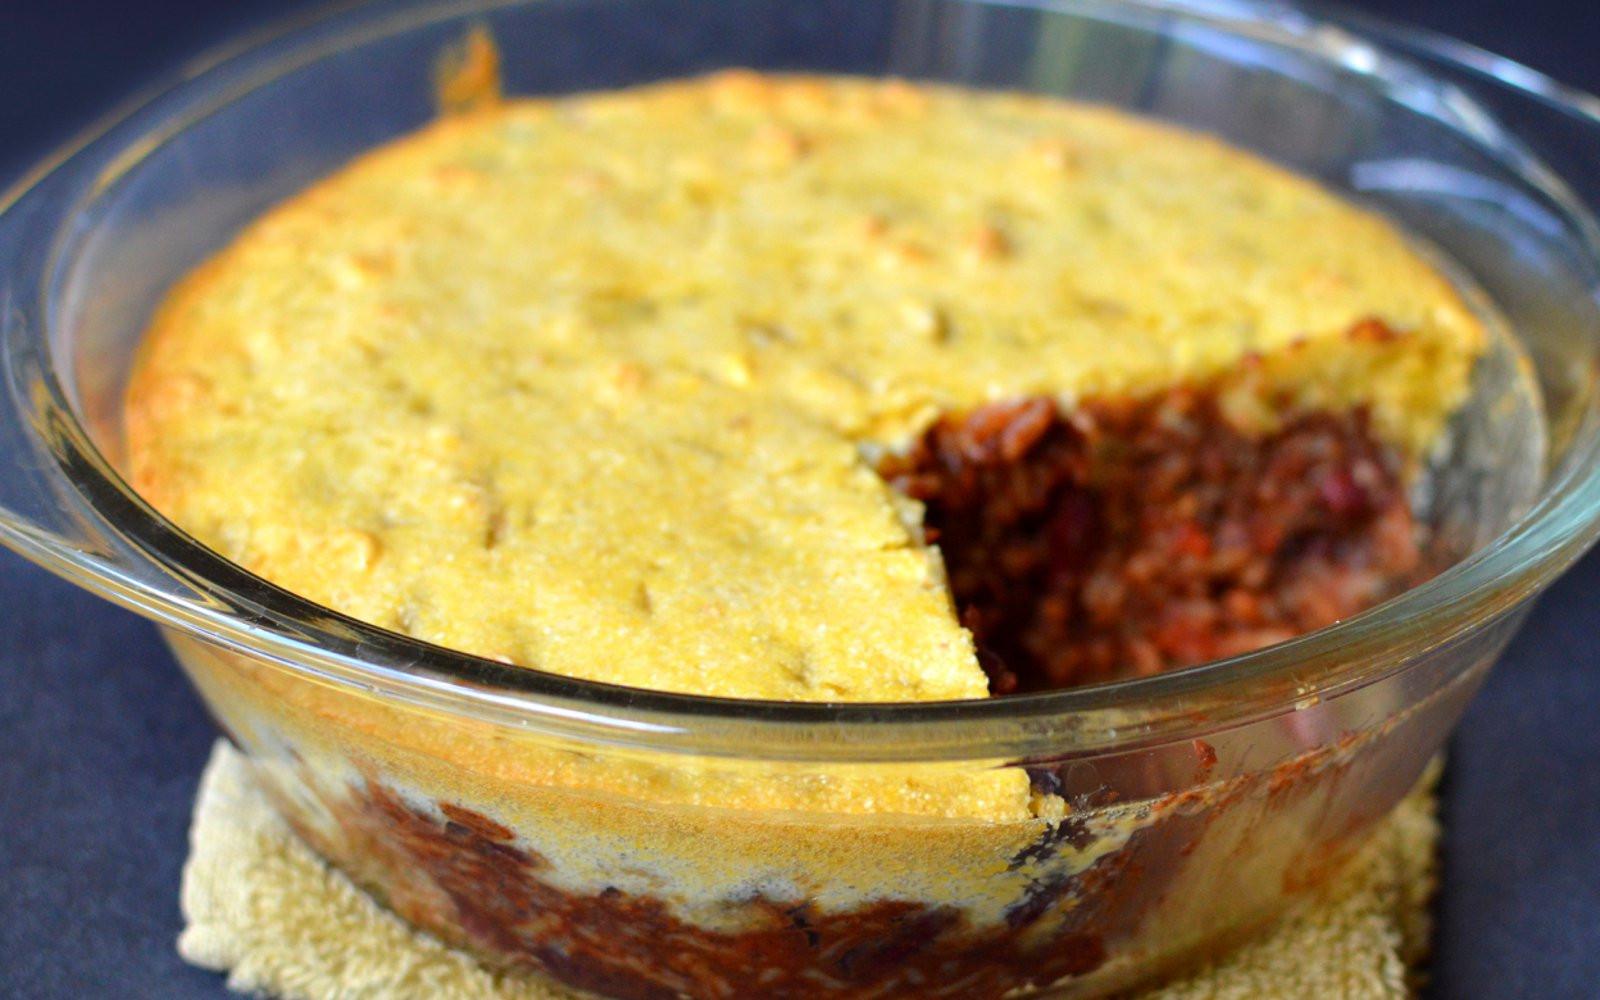 Chili Cornbread Casserole  Chili Cornbread Casserole [Vegan] e Green Planet e